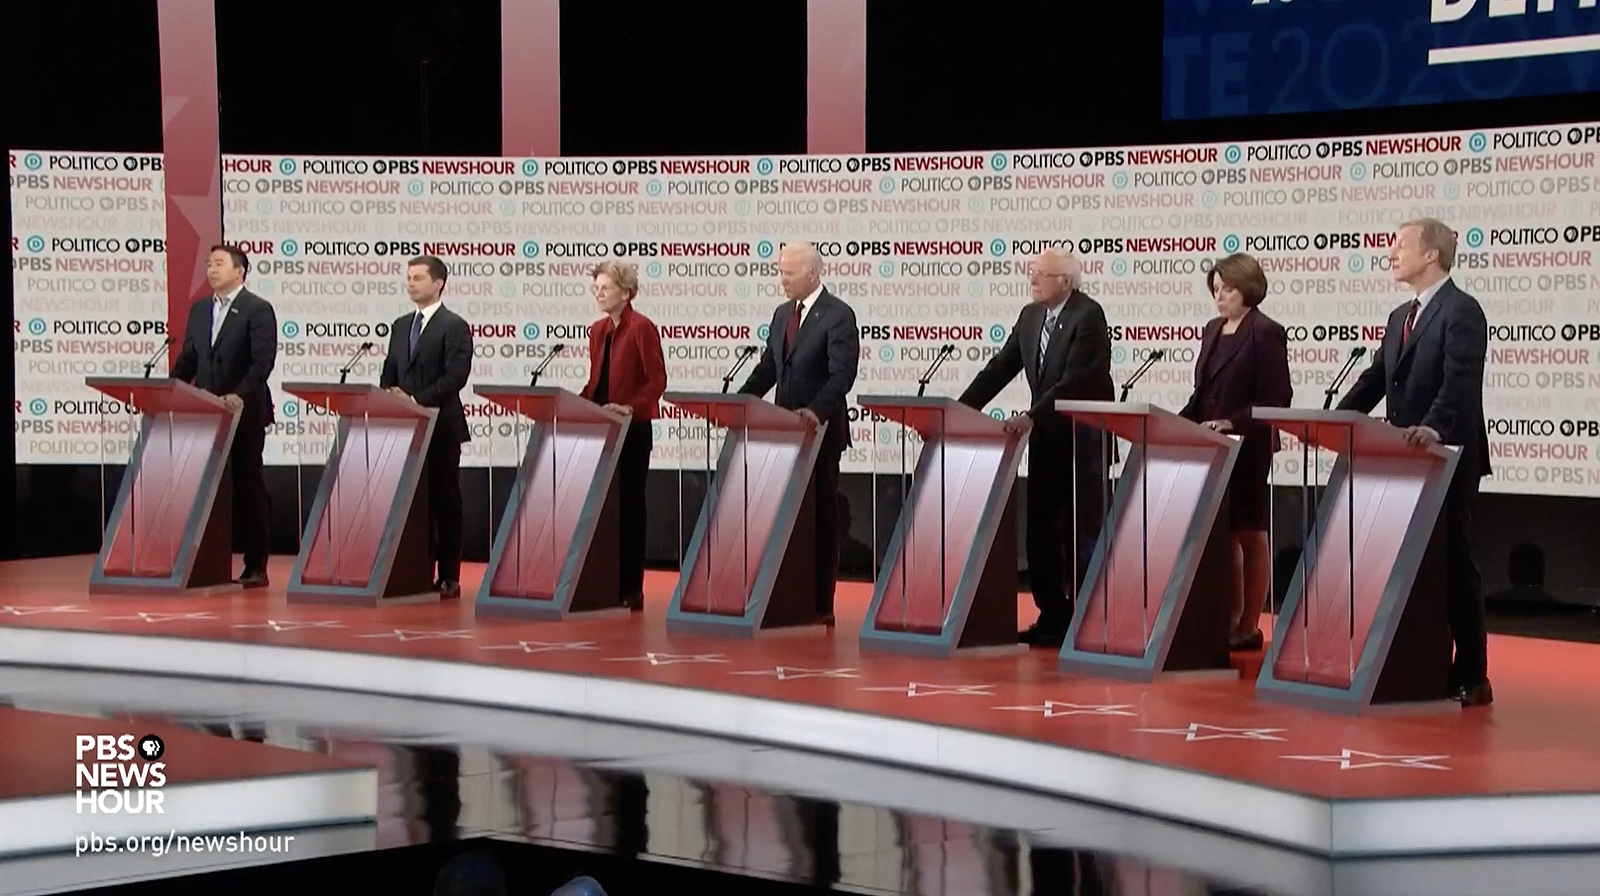 NCS_PBS-NewsHour_Politico_Democratic-Debate_006